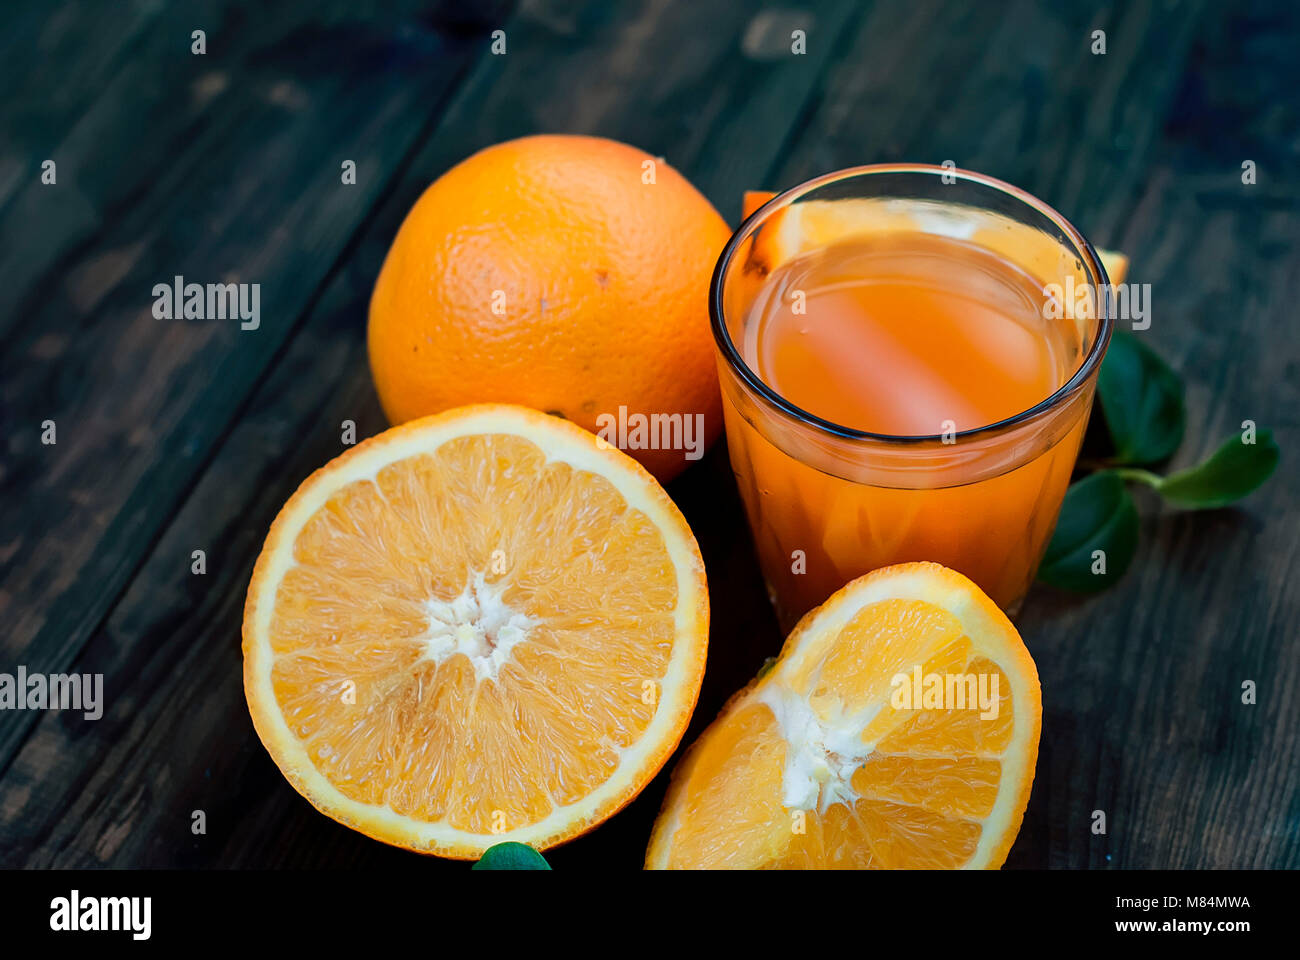 glass of fresh orange juice, whole orange and orange slices group on a dark wooden table - Stock Image